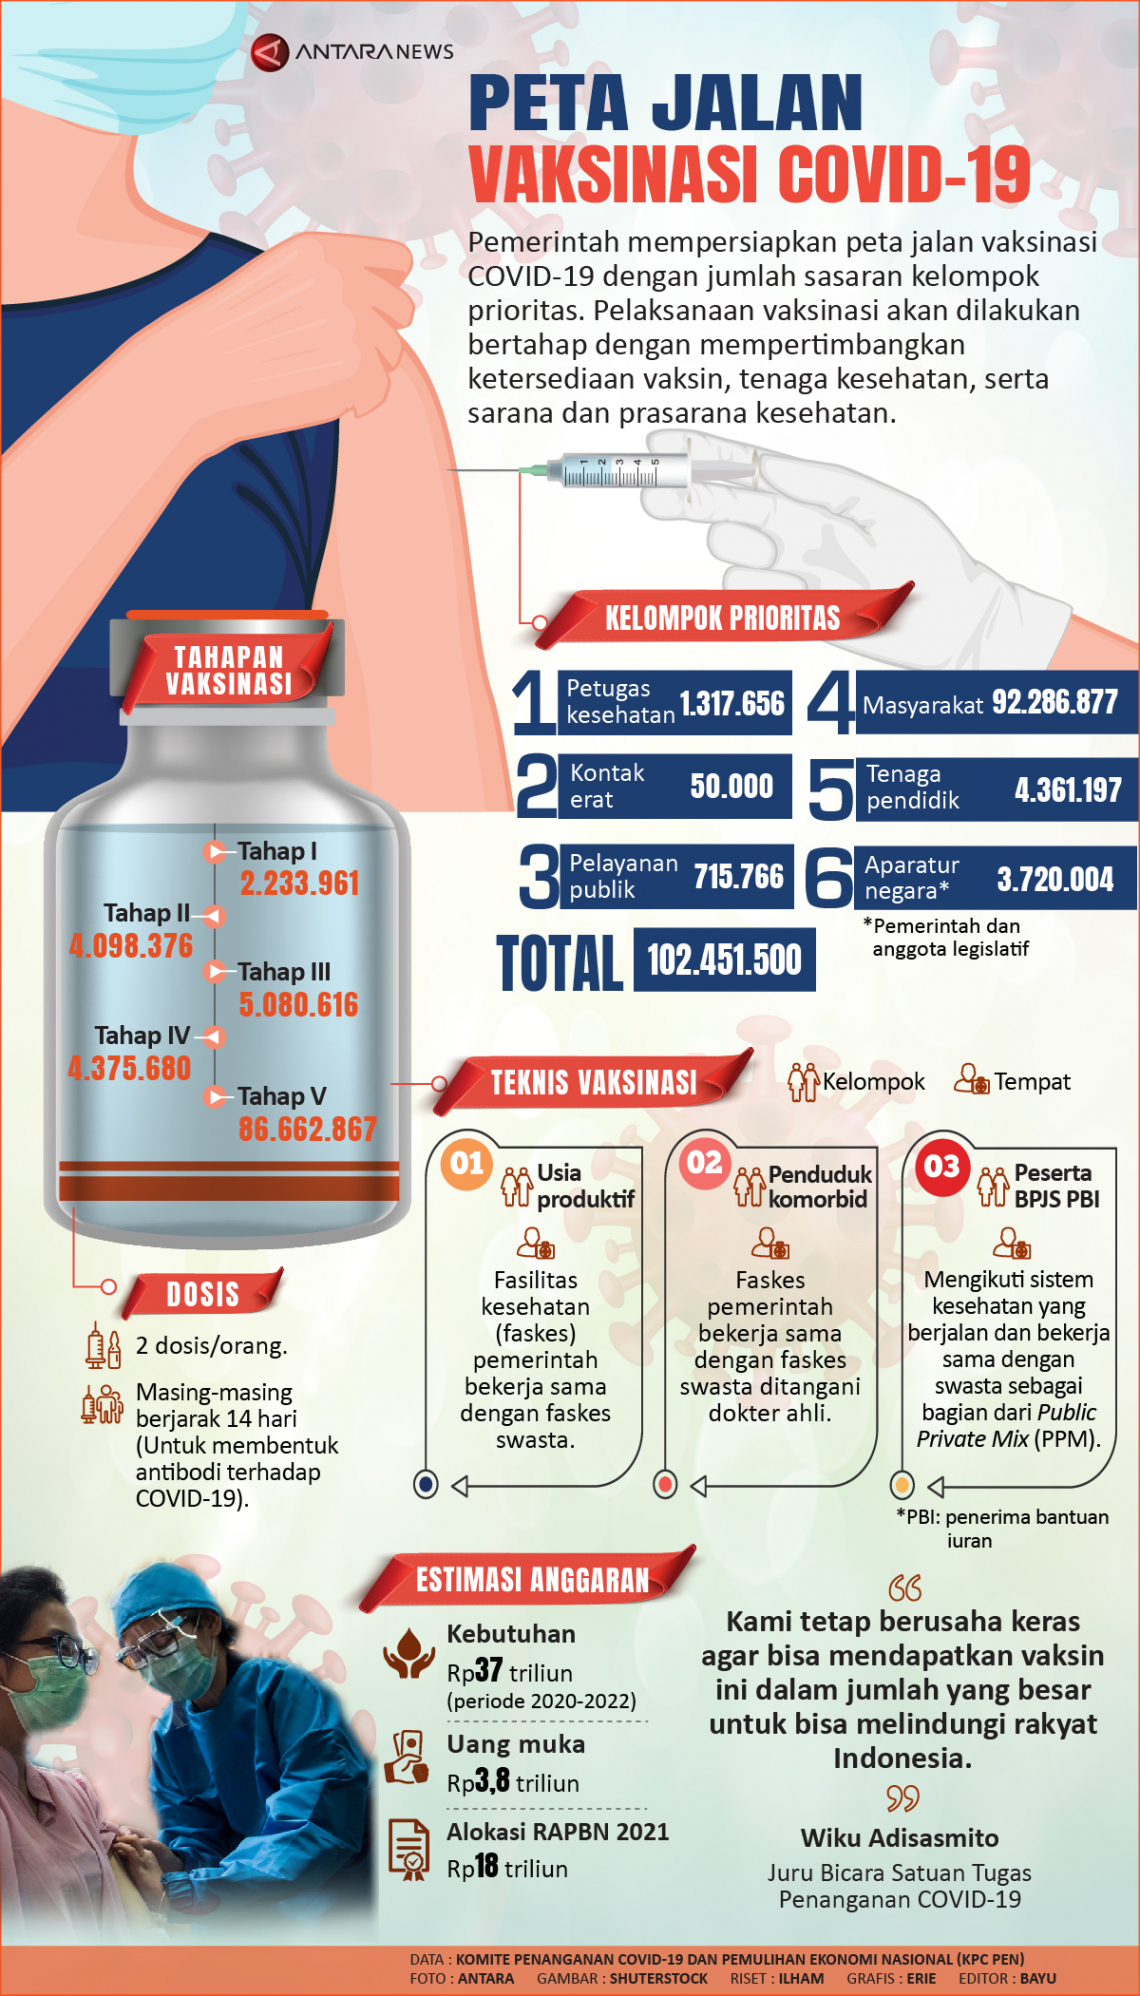 Peta jalan vaksinasi COVID-19